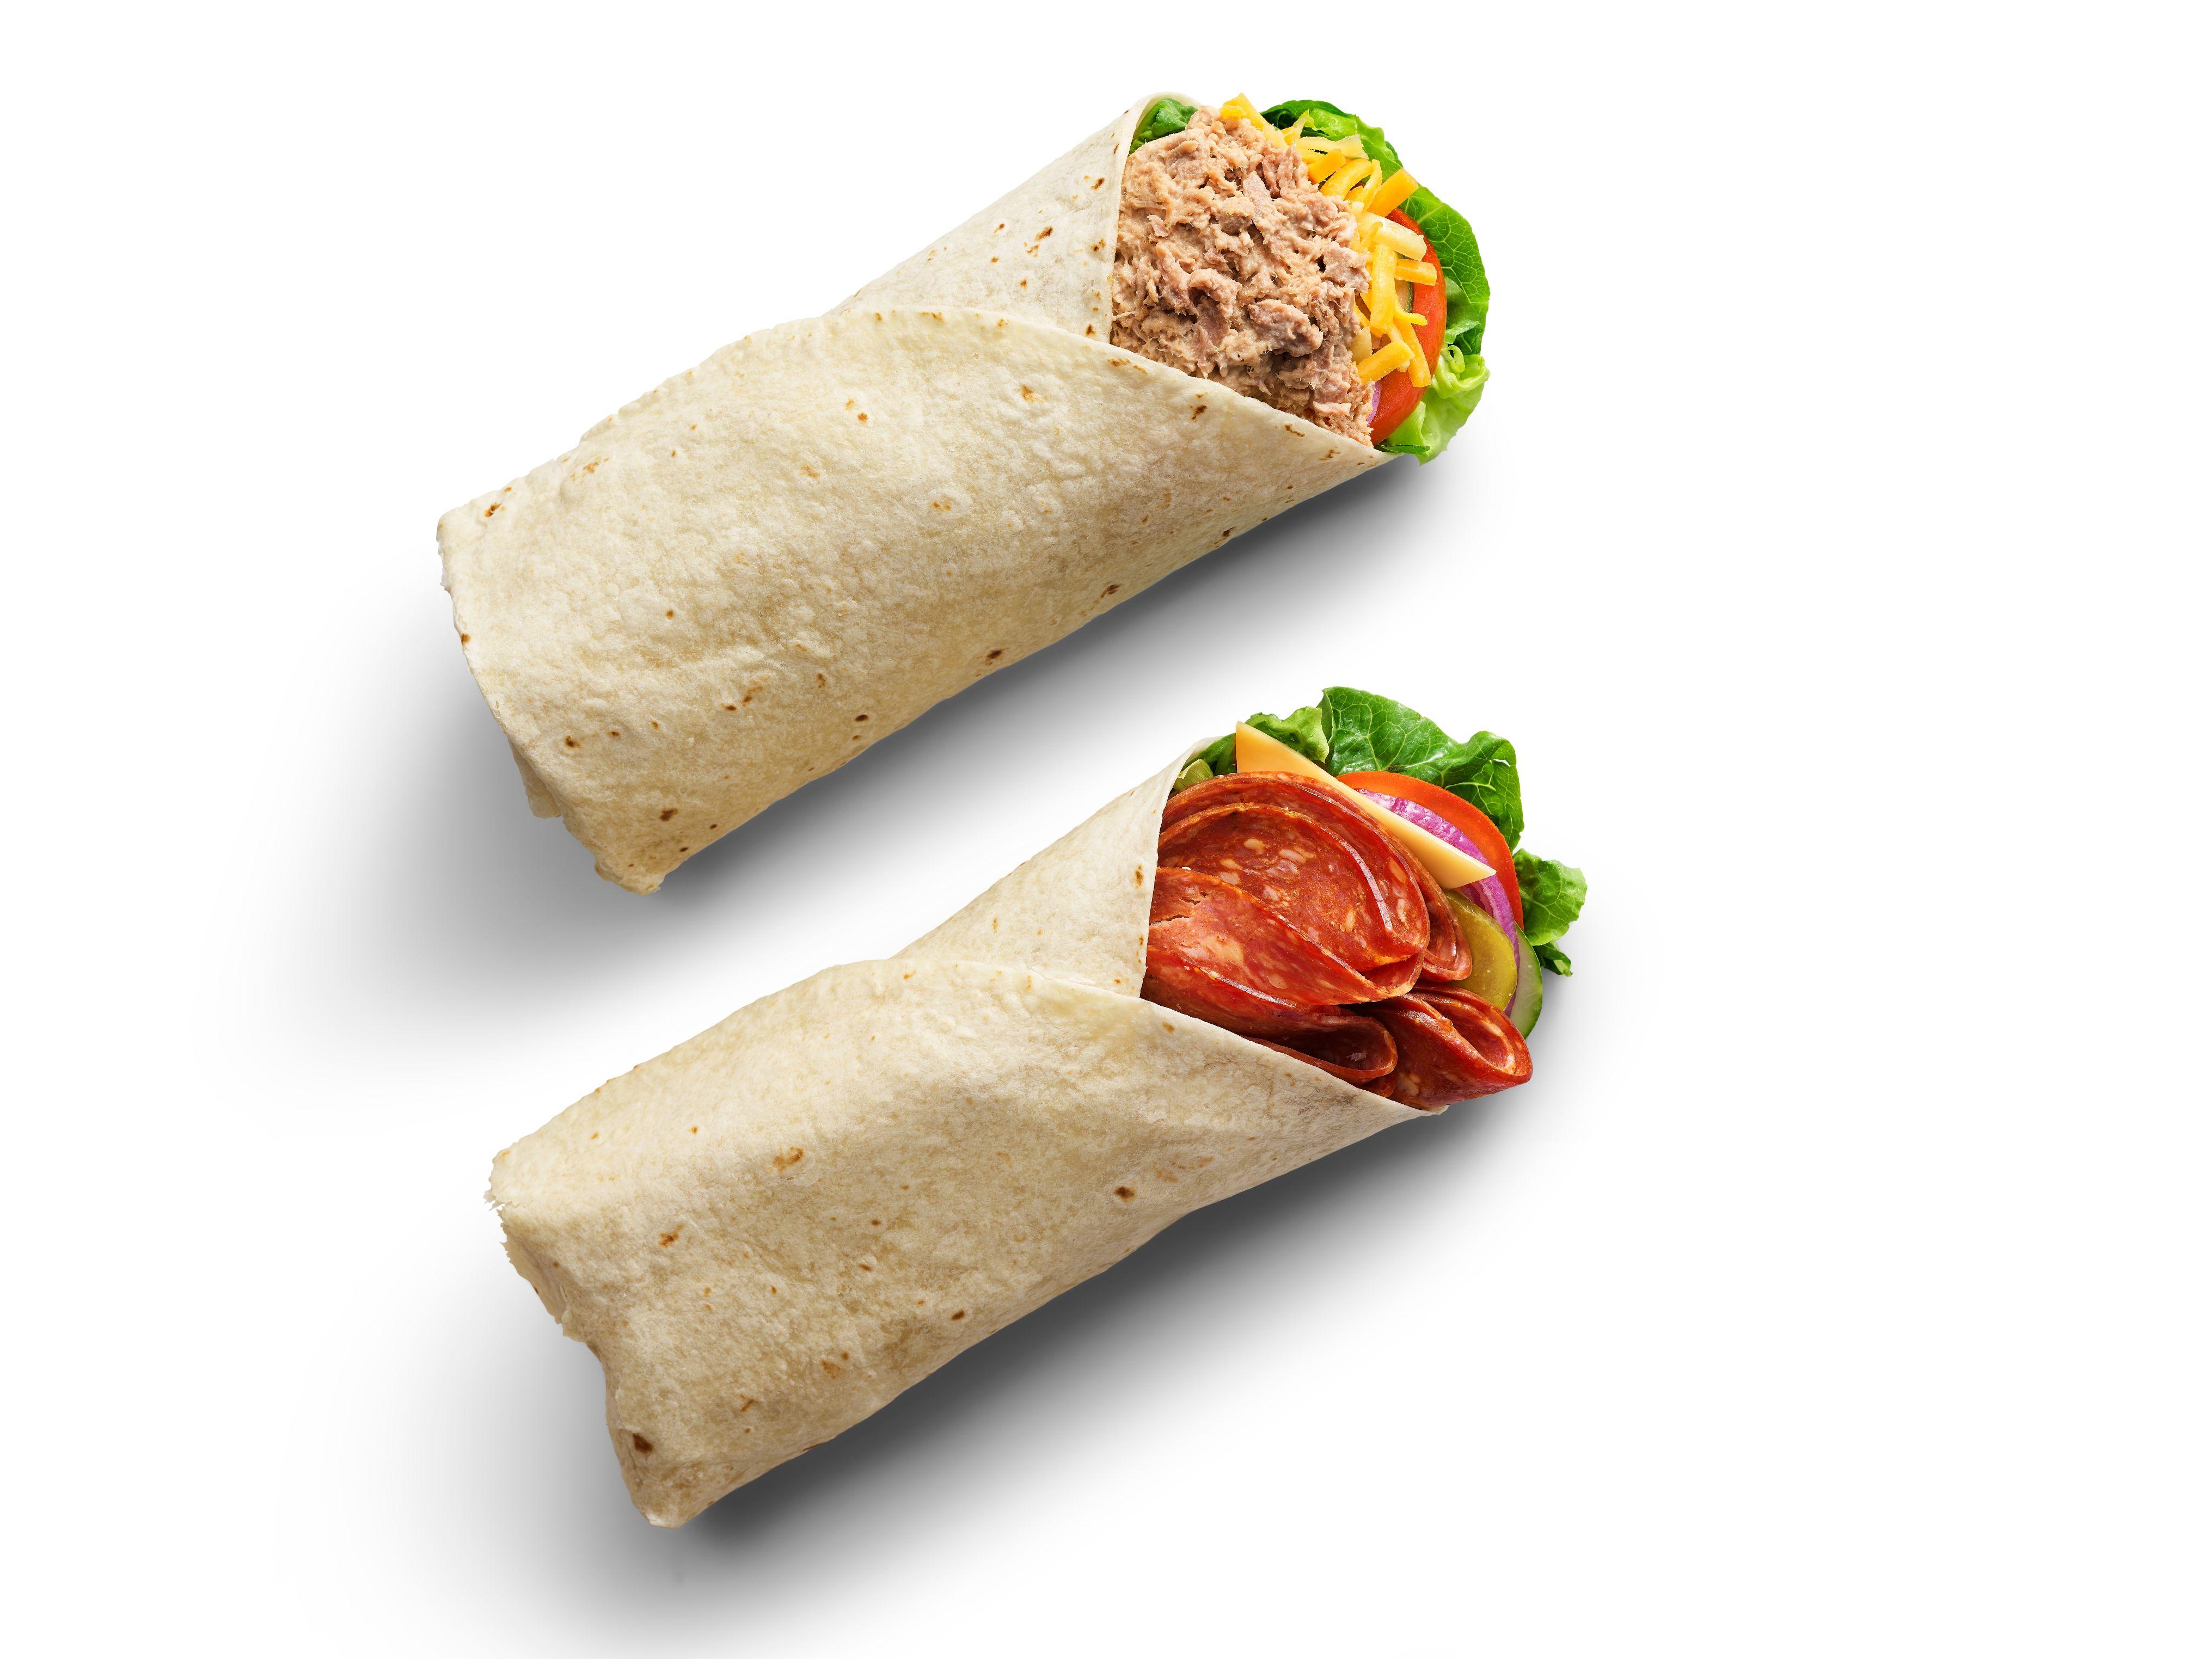 Subway (AMK Hub) - Dine, Shop, Earn